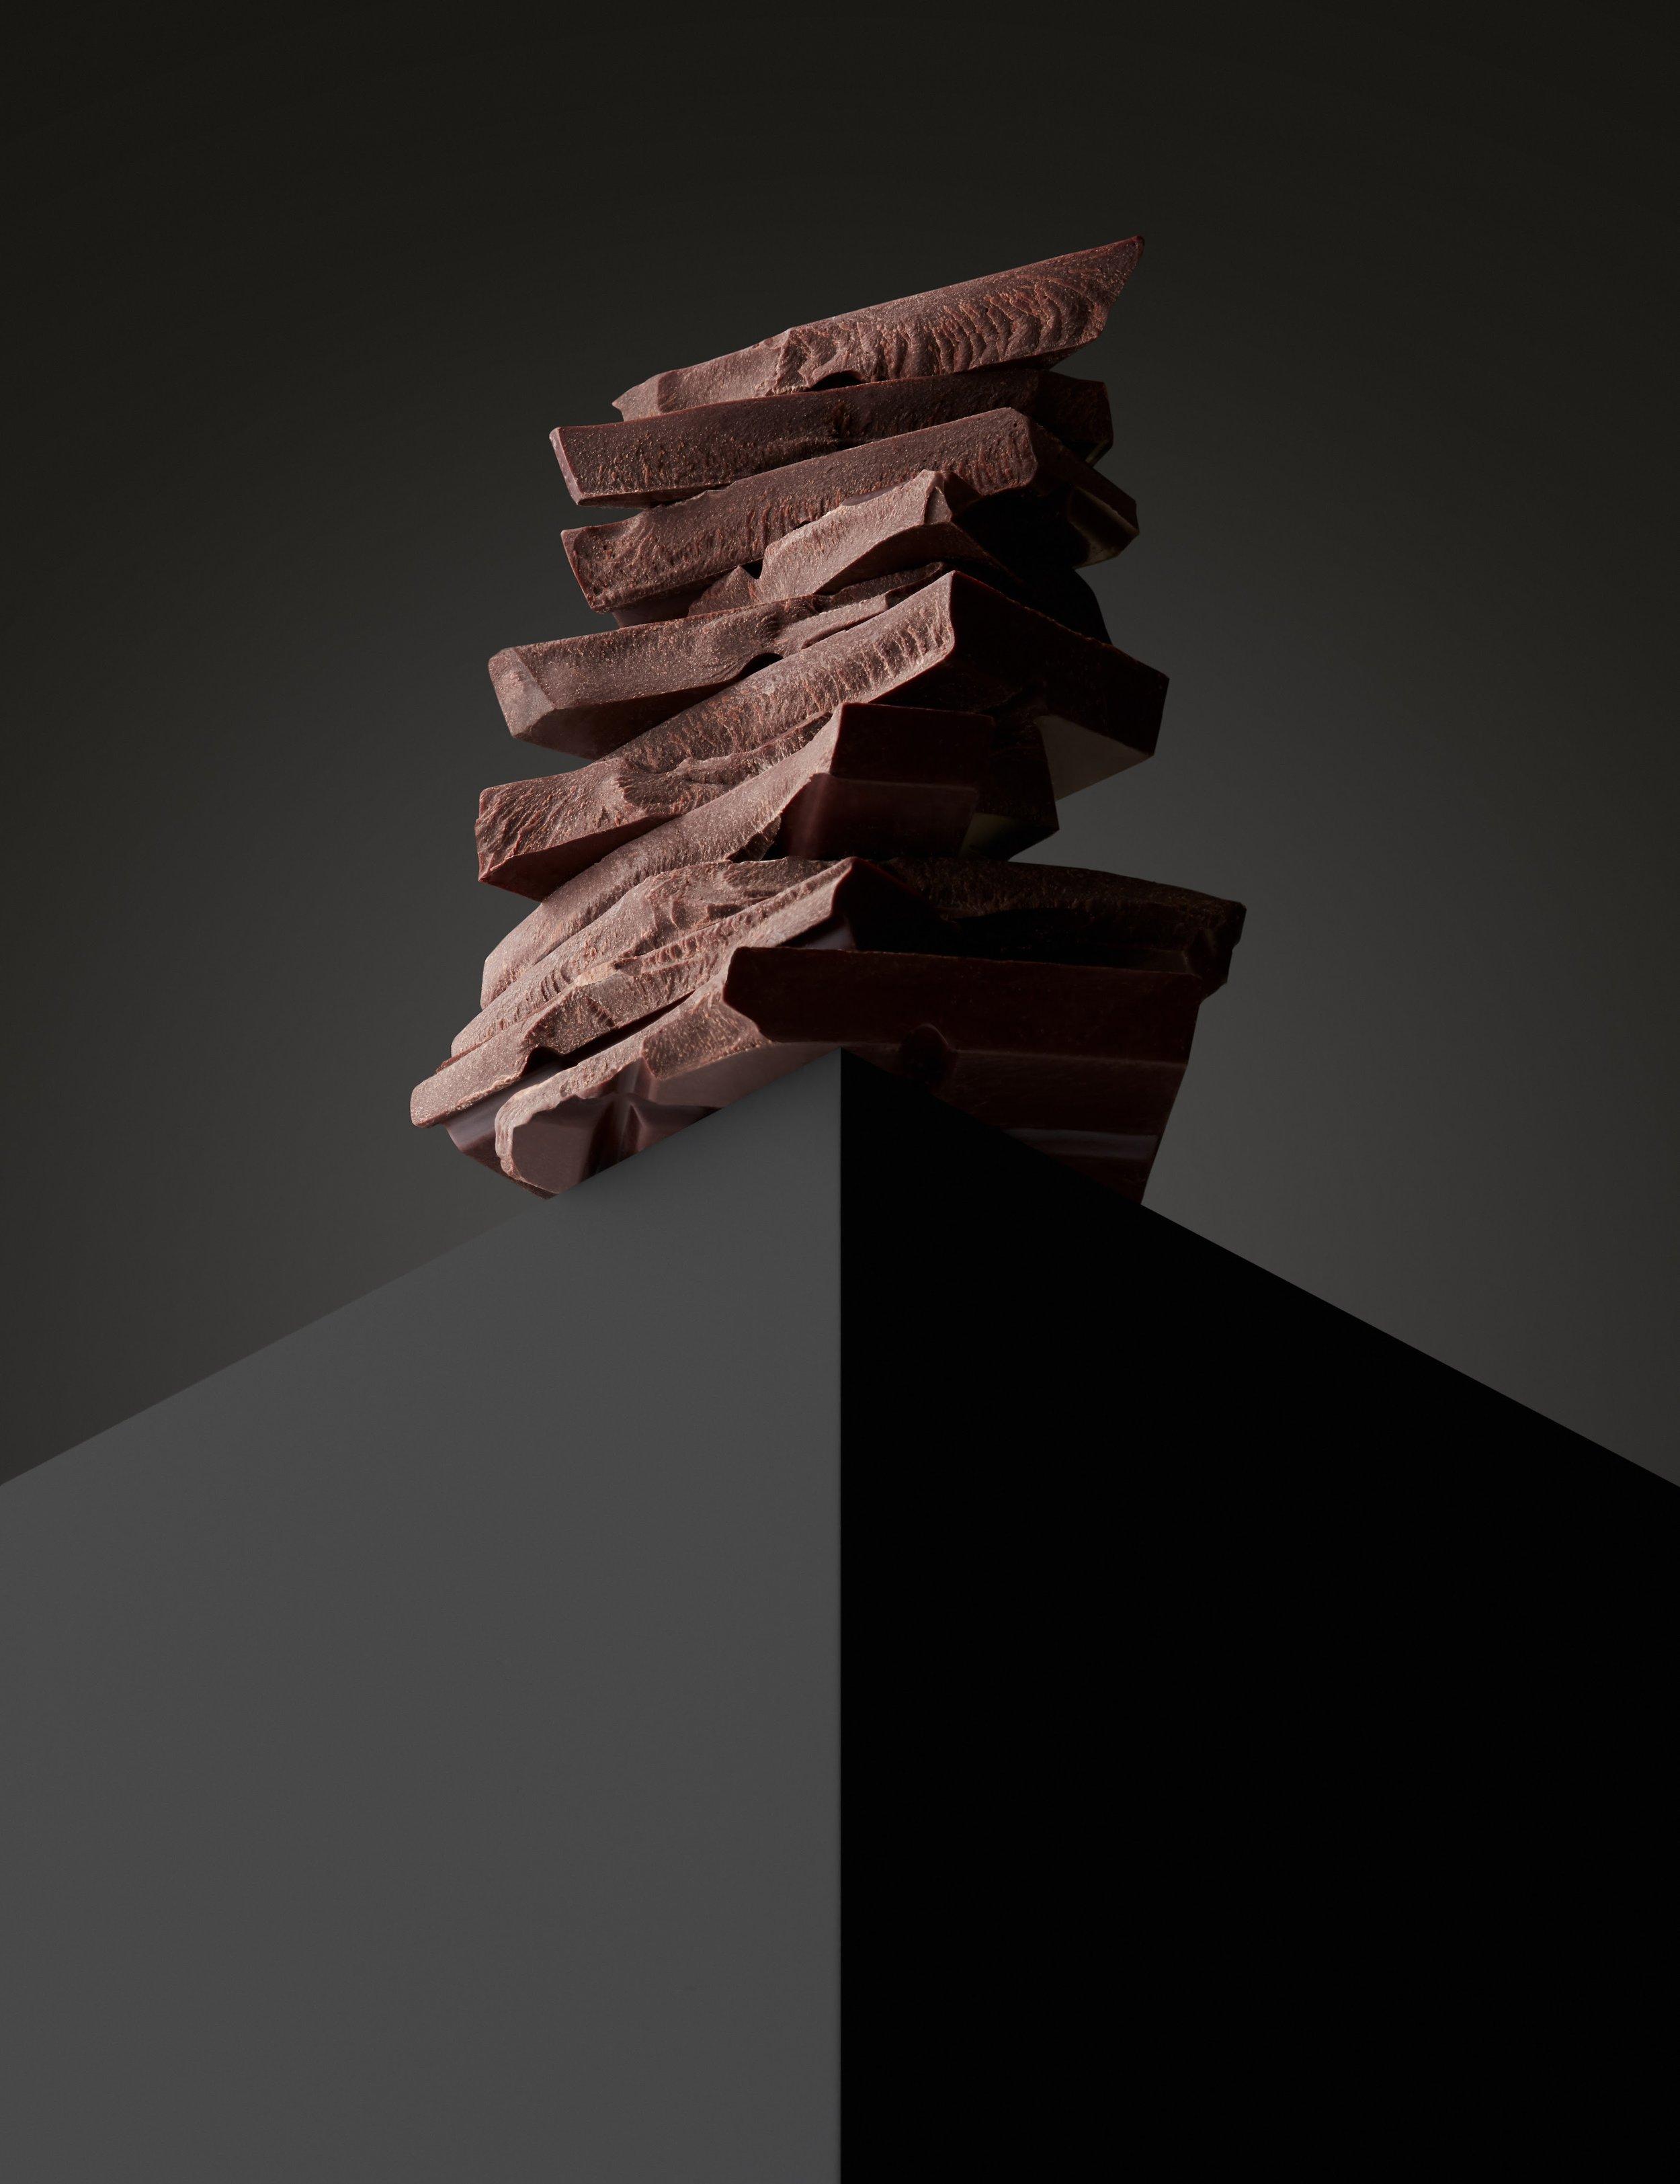 Zuki_Turner_Creative Direction_chocolate-architecture-still-life-photography-1.jpg